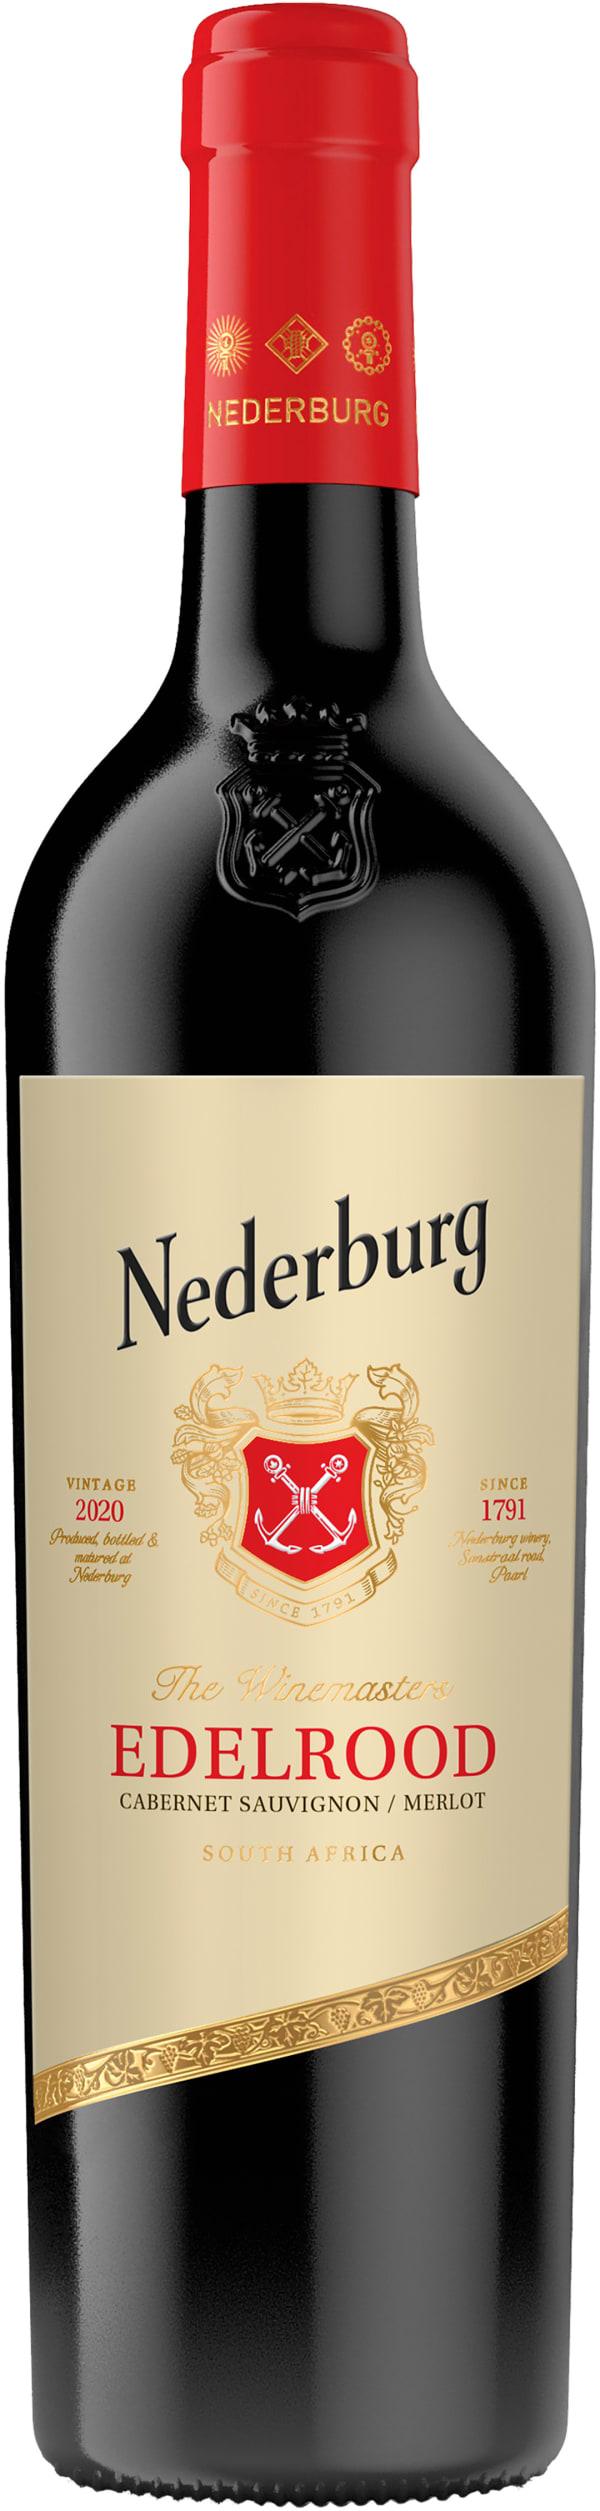 Nederburg Winemaster's Edelrood 2016